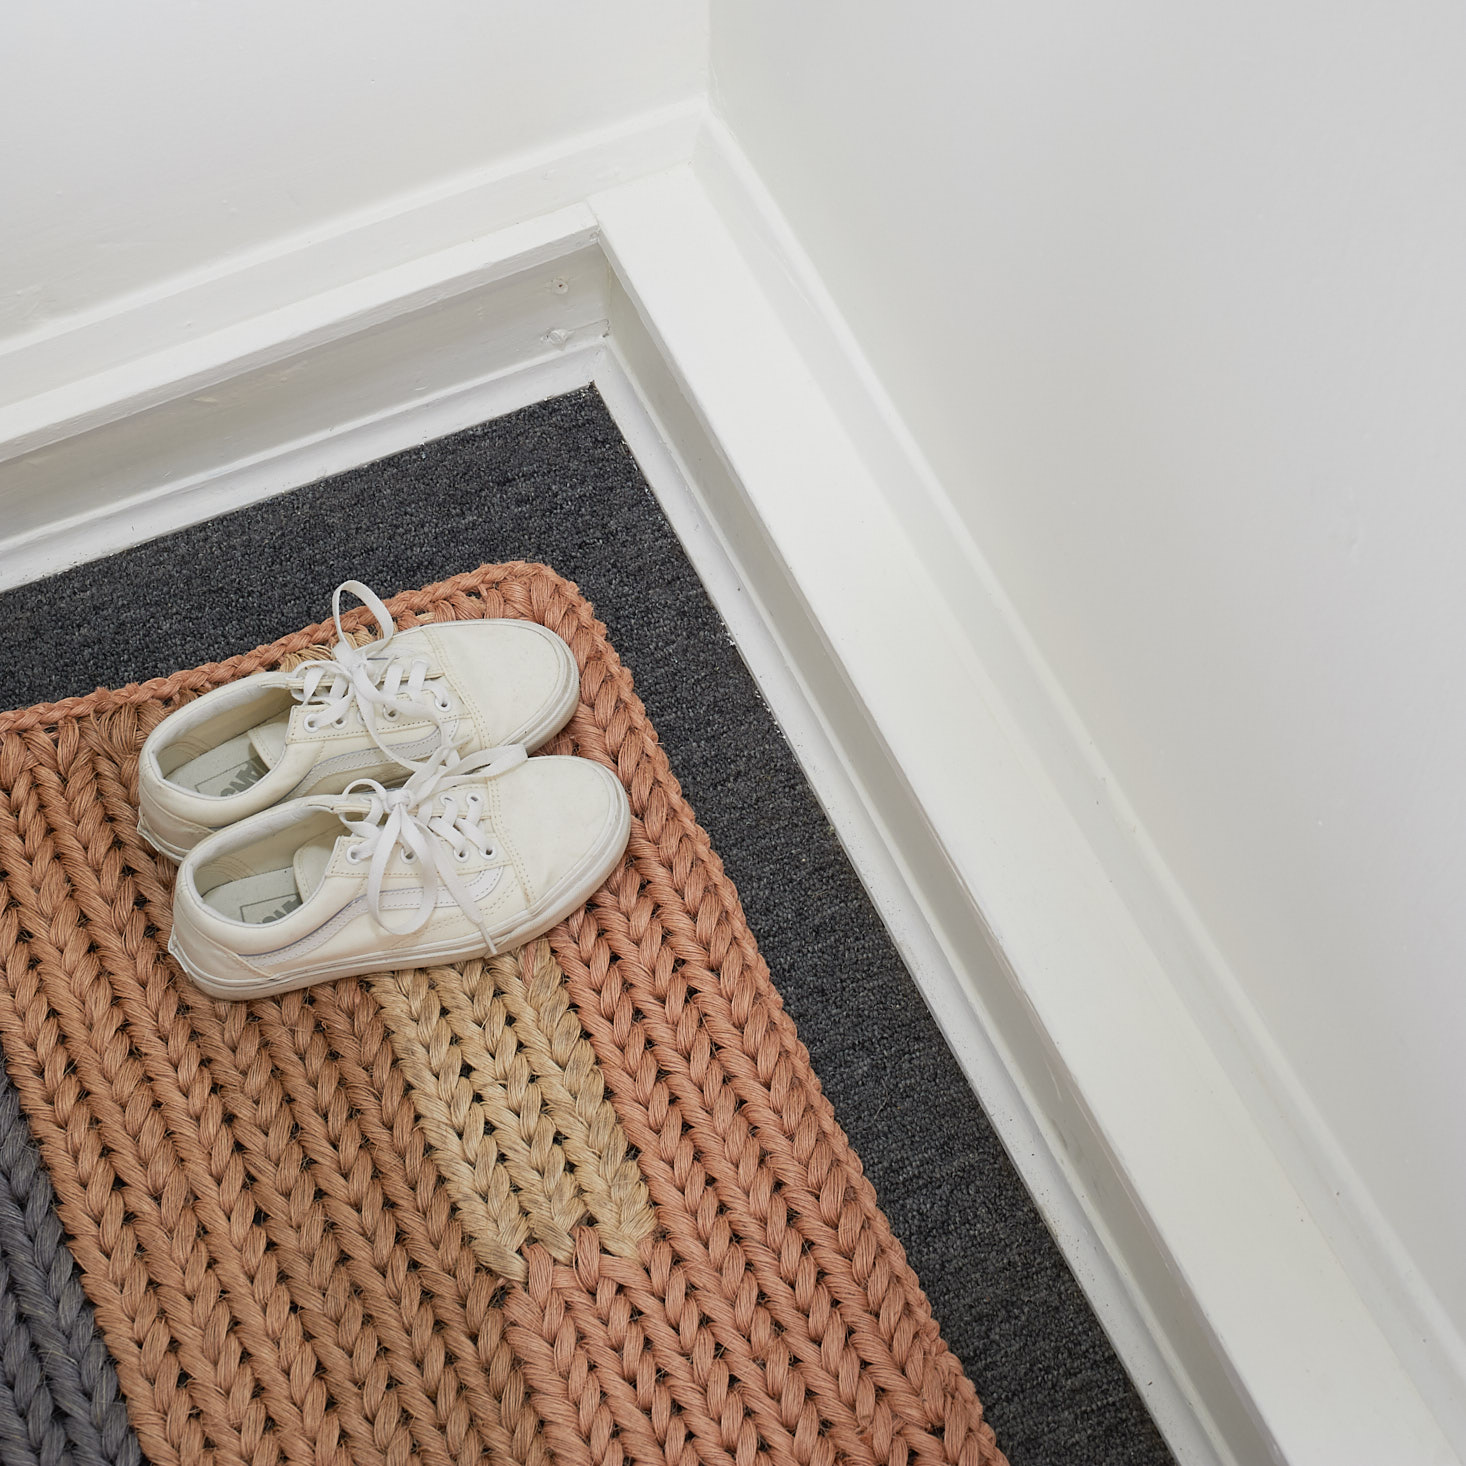 detail of white vans and someware floor mat